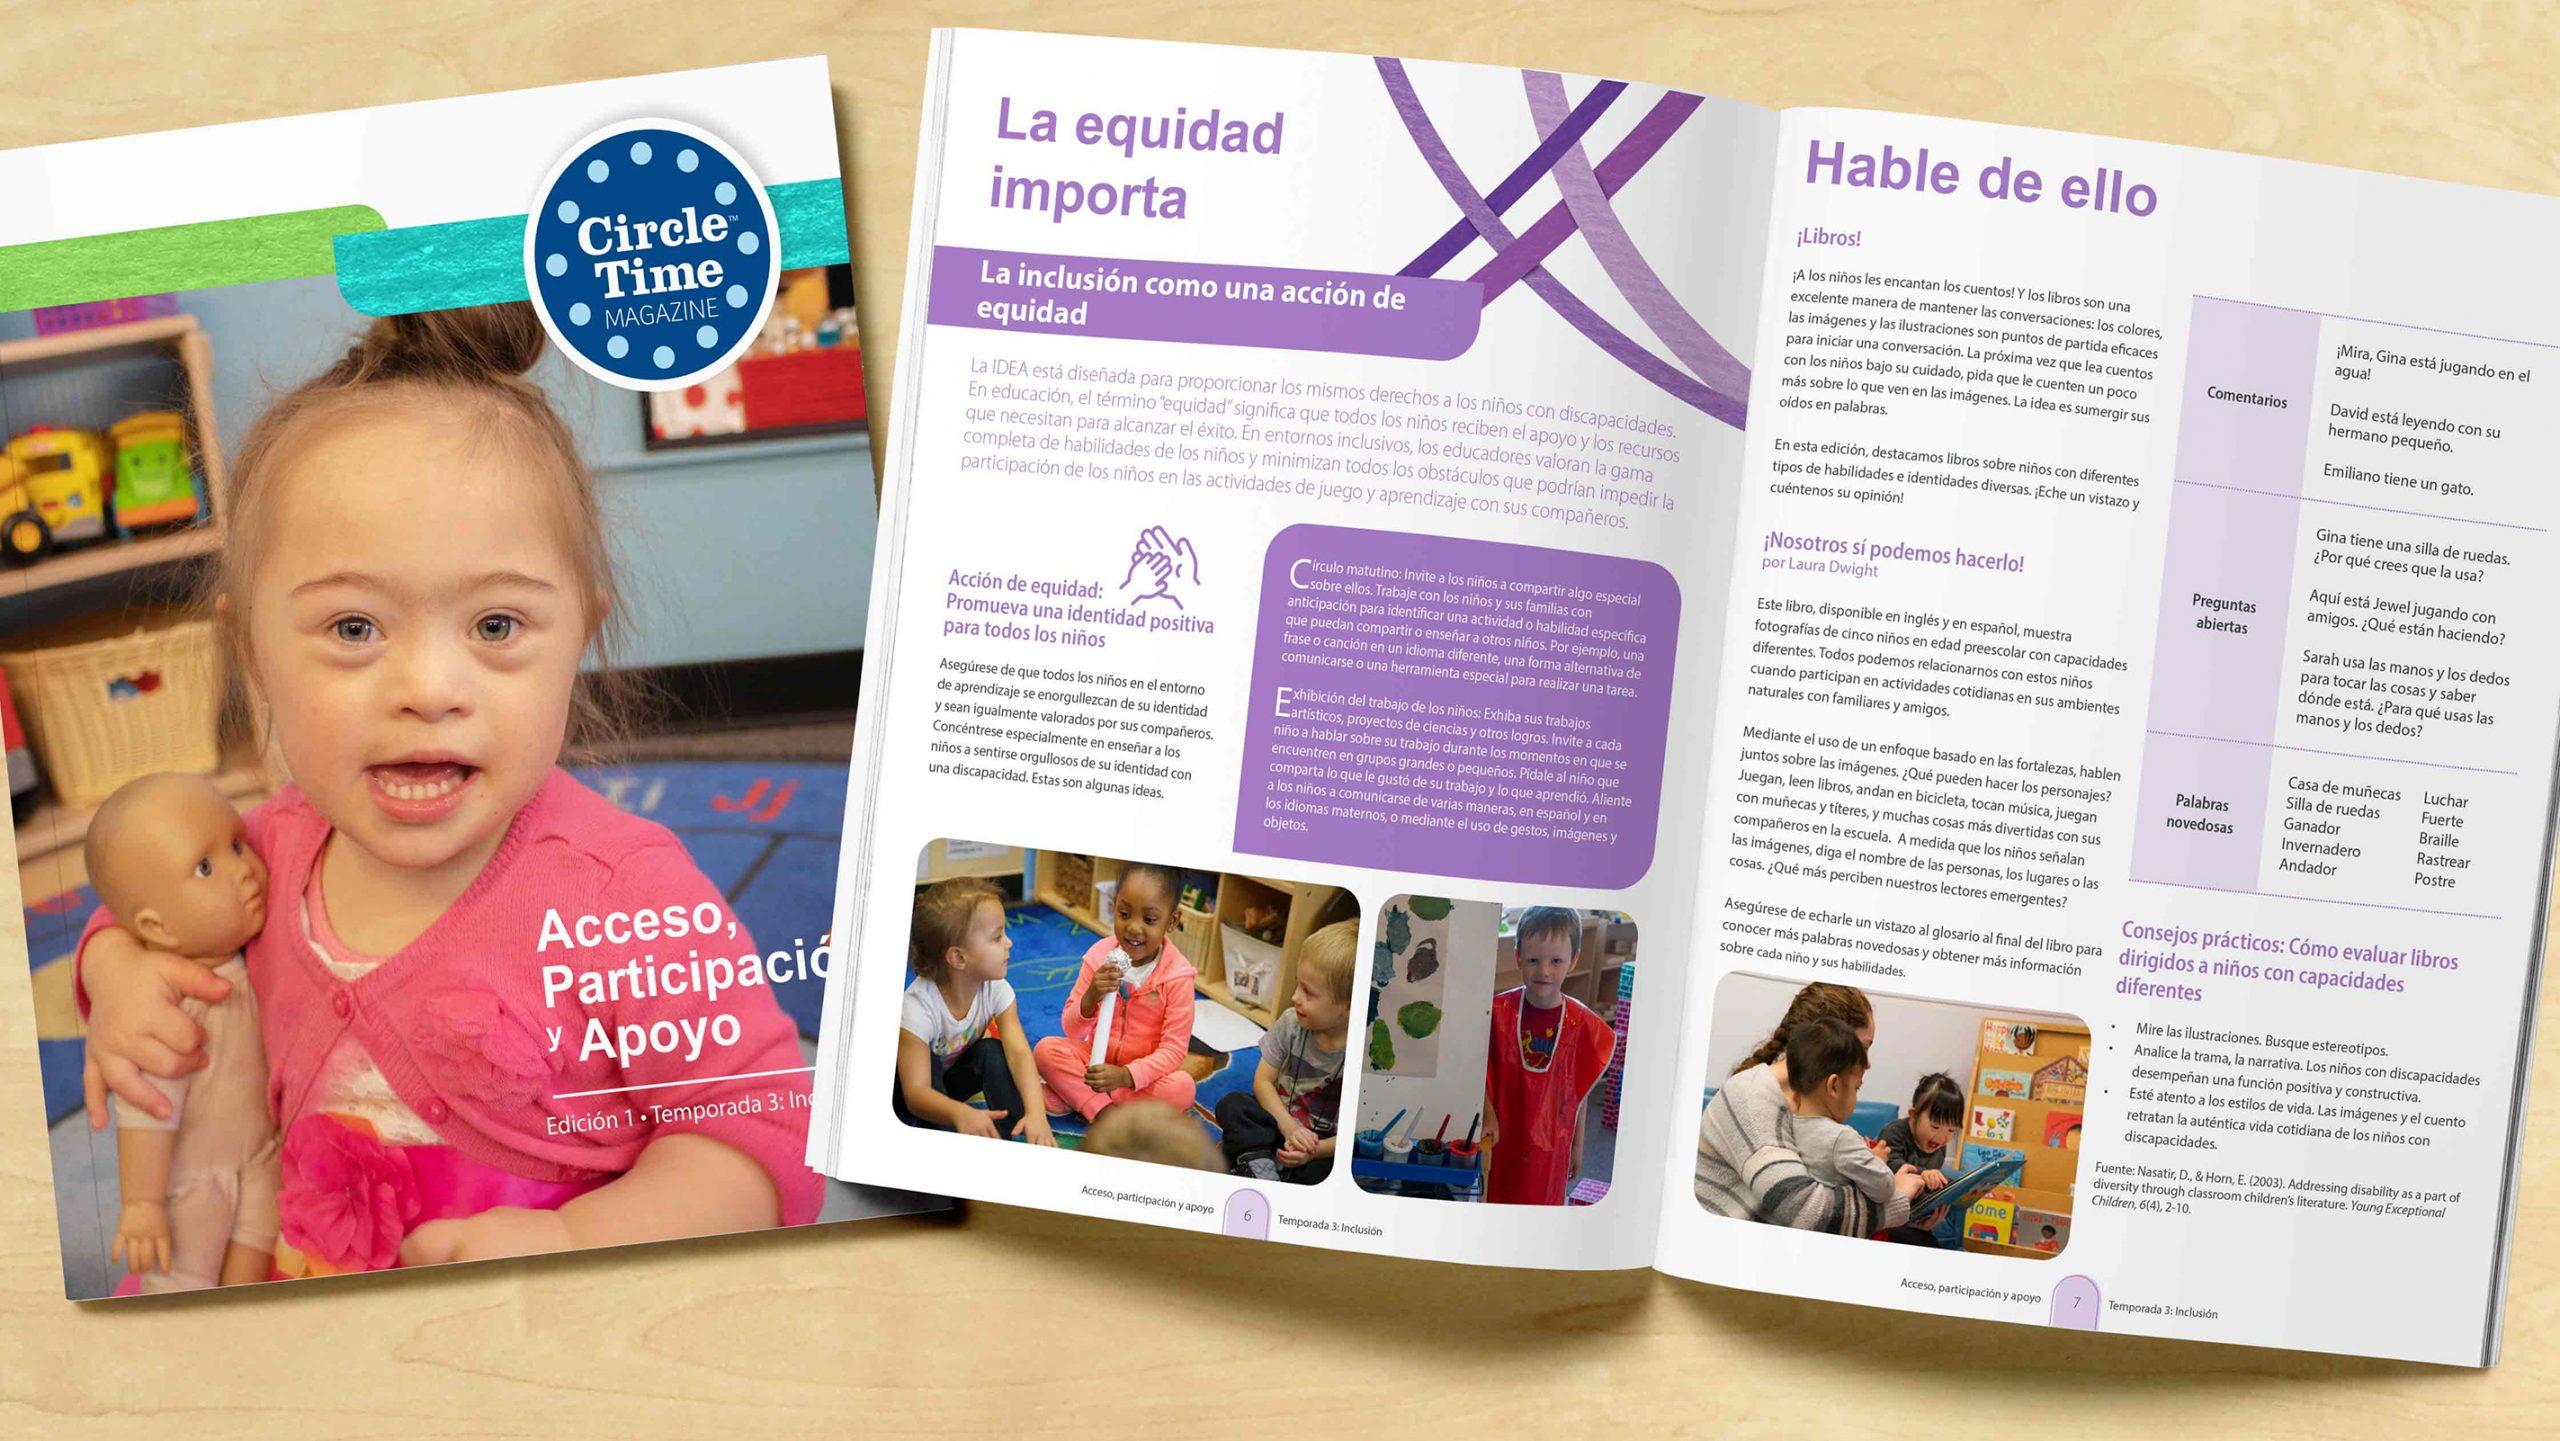 Circle Time Magazine Season 3 Episode 1 Spanish Magazine Cover